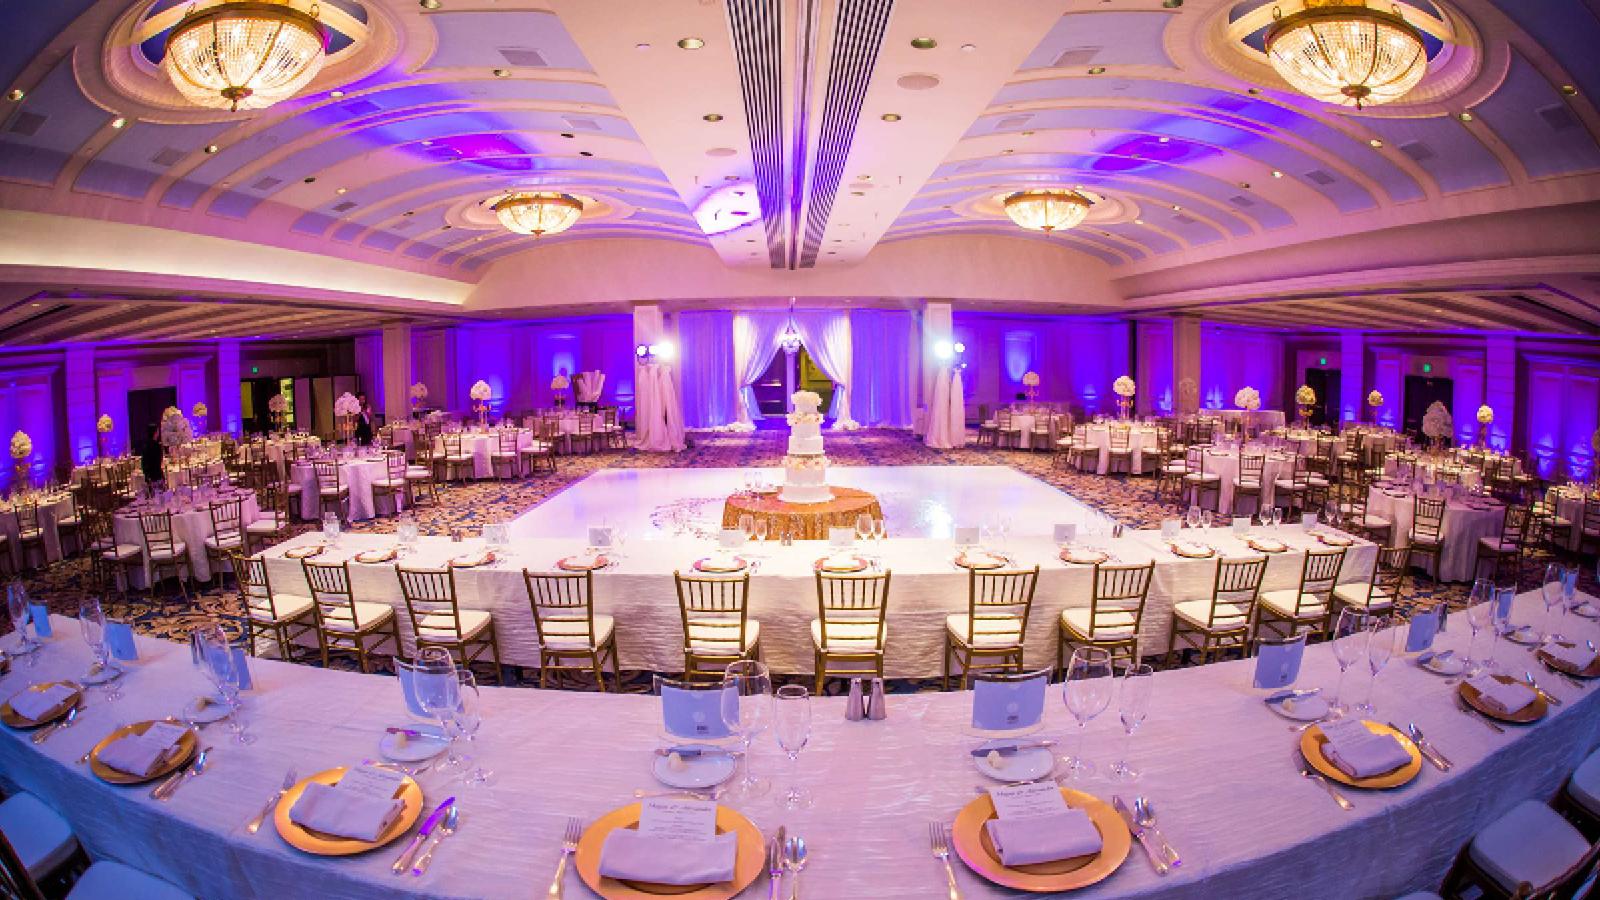 Presidential-Ballroom-Page---True-Photography-1600x900.jpg